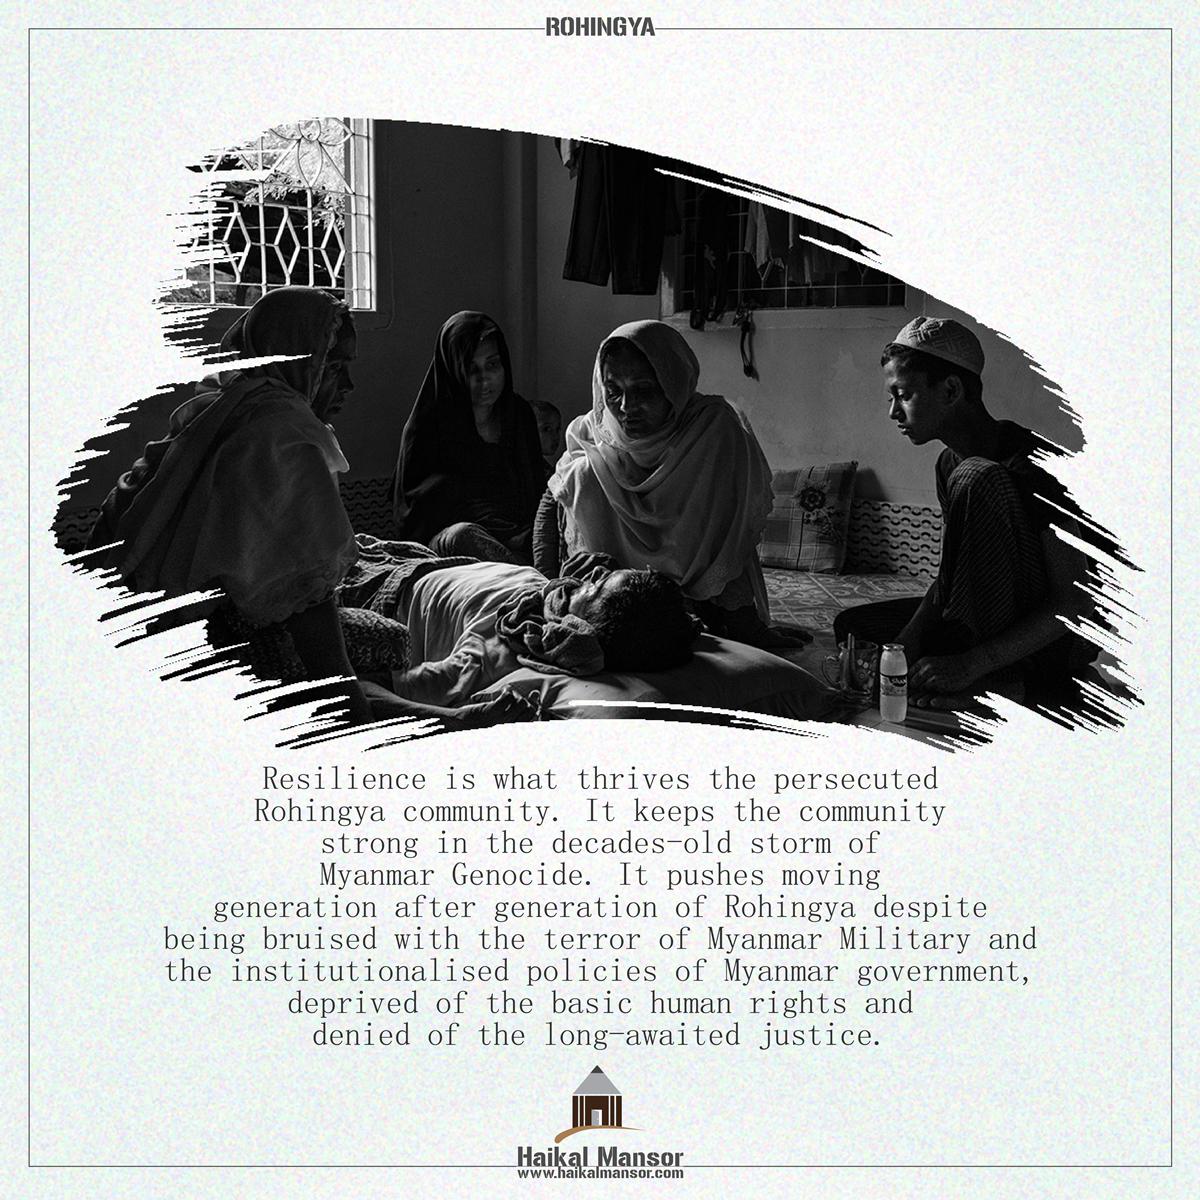 Resilience - Rohingya-01-01